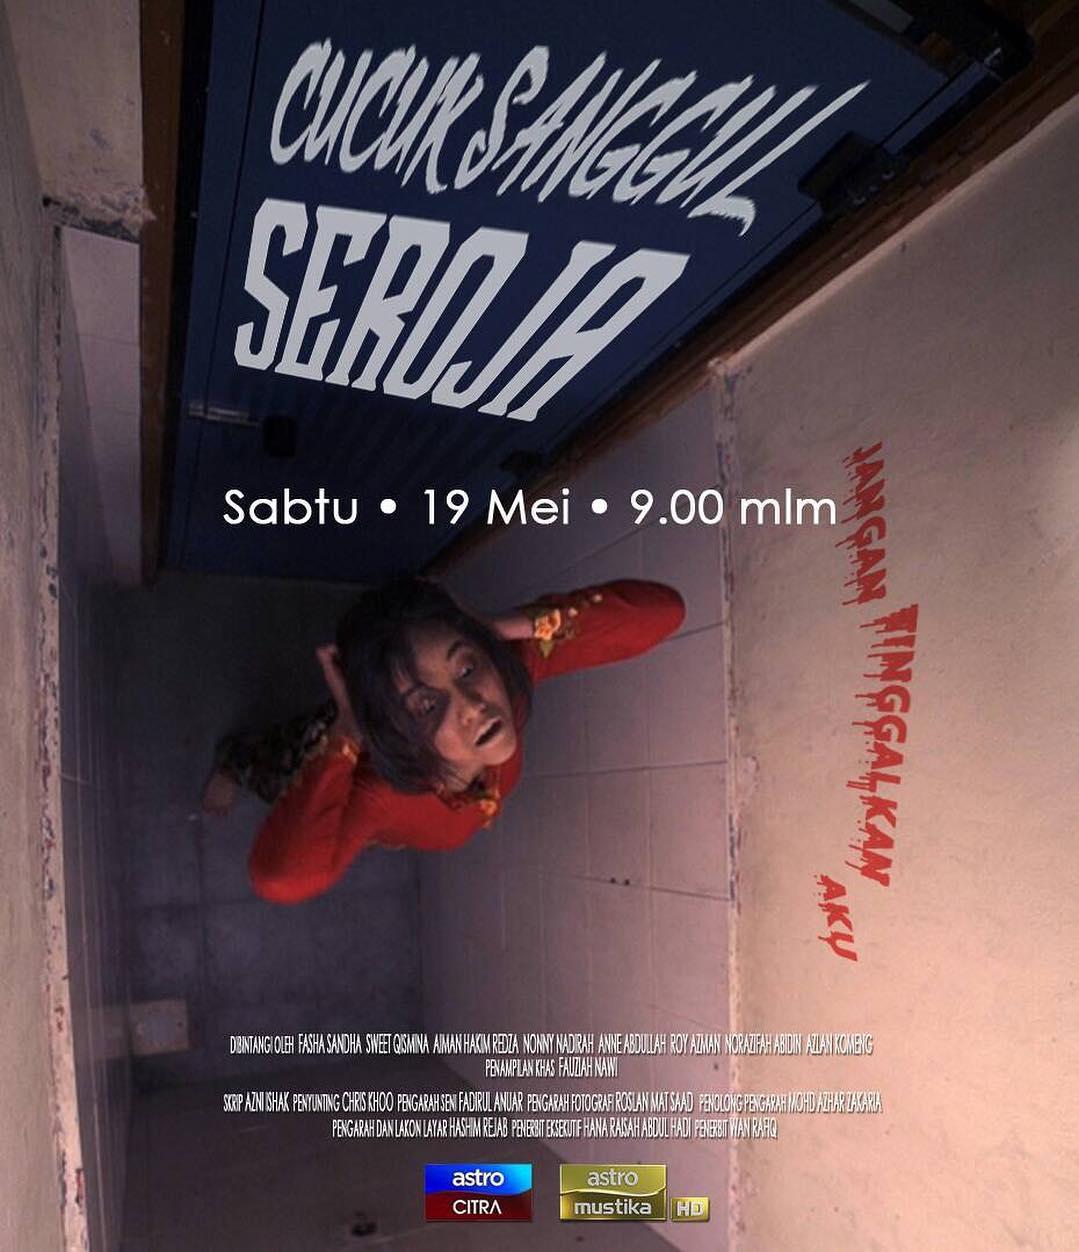 Cucuk Sanggul Seroja (2018)